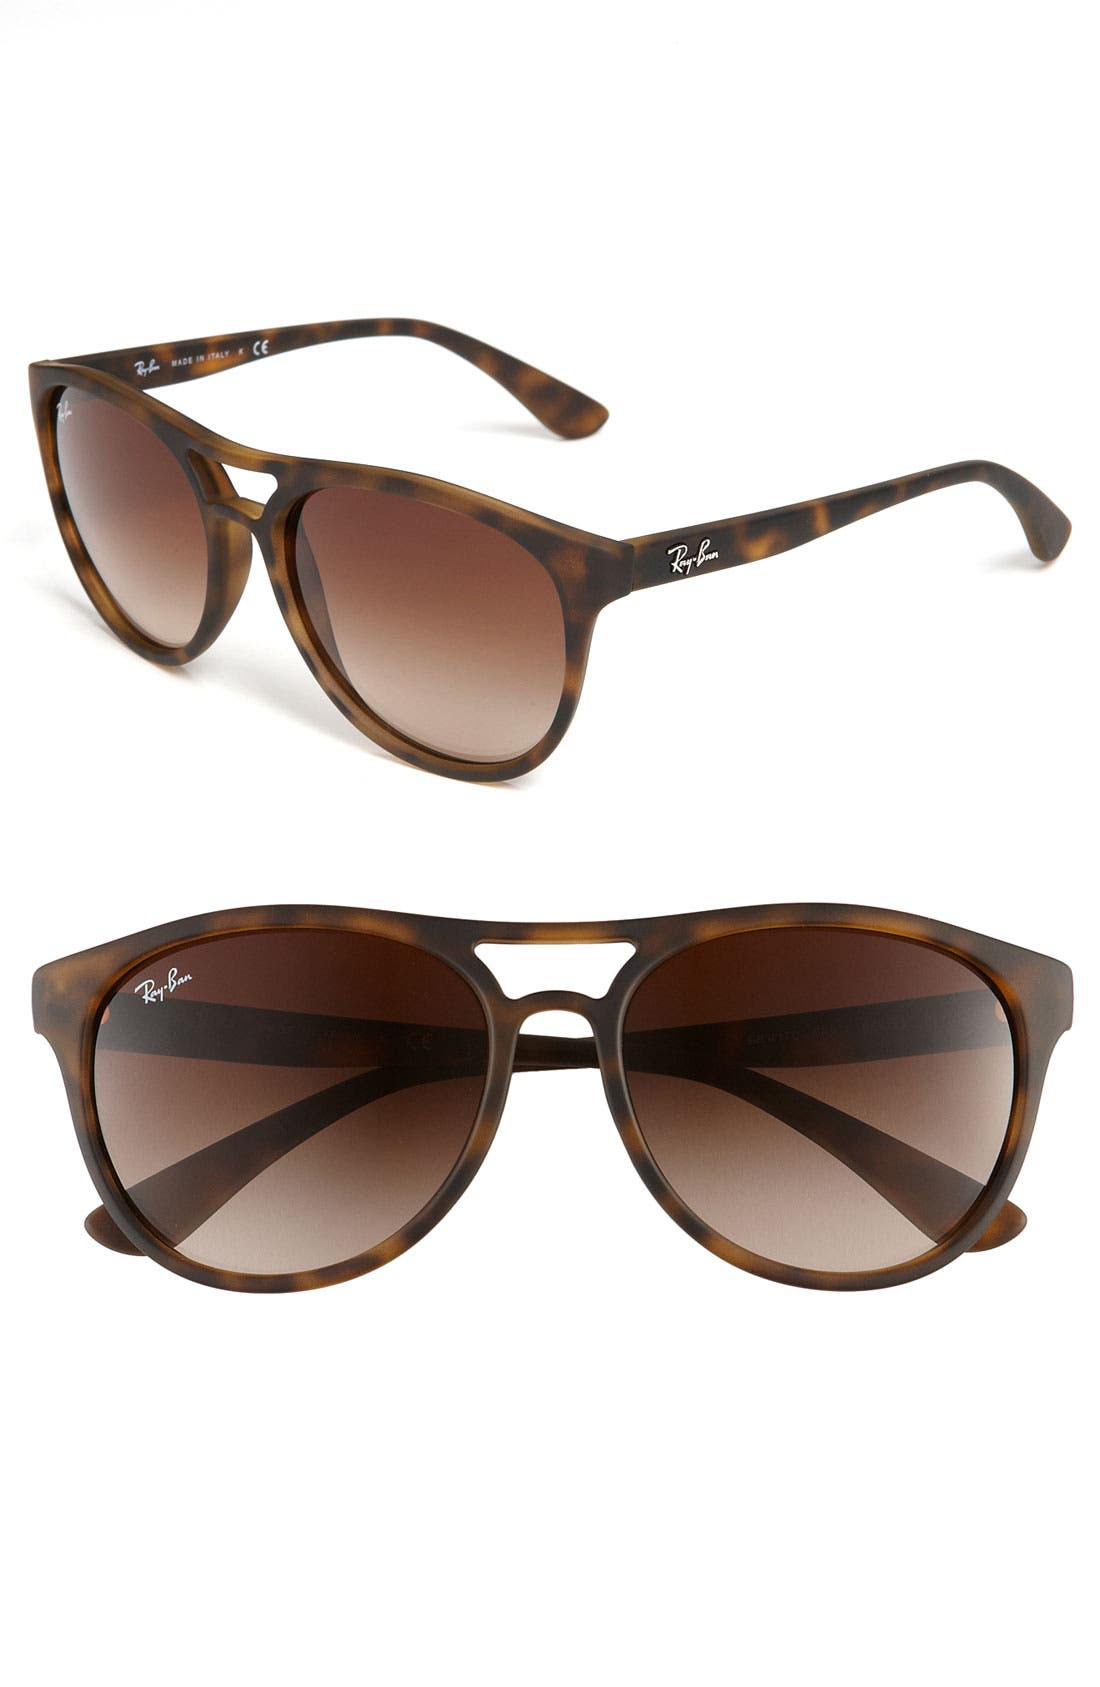 Alternate Image 1 Selected - Ray-Ban 'Wayfarer' 58mm Sunglasses